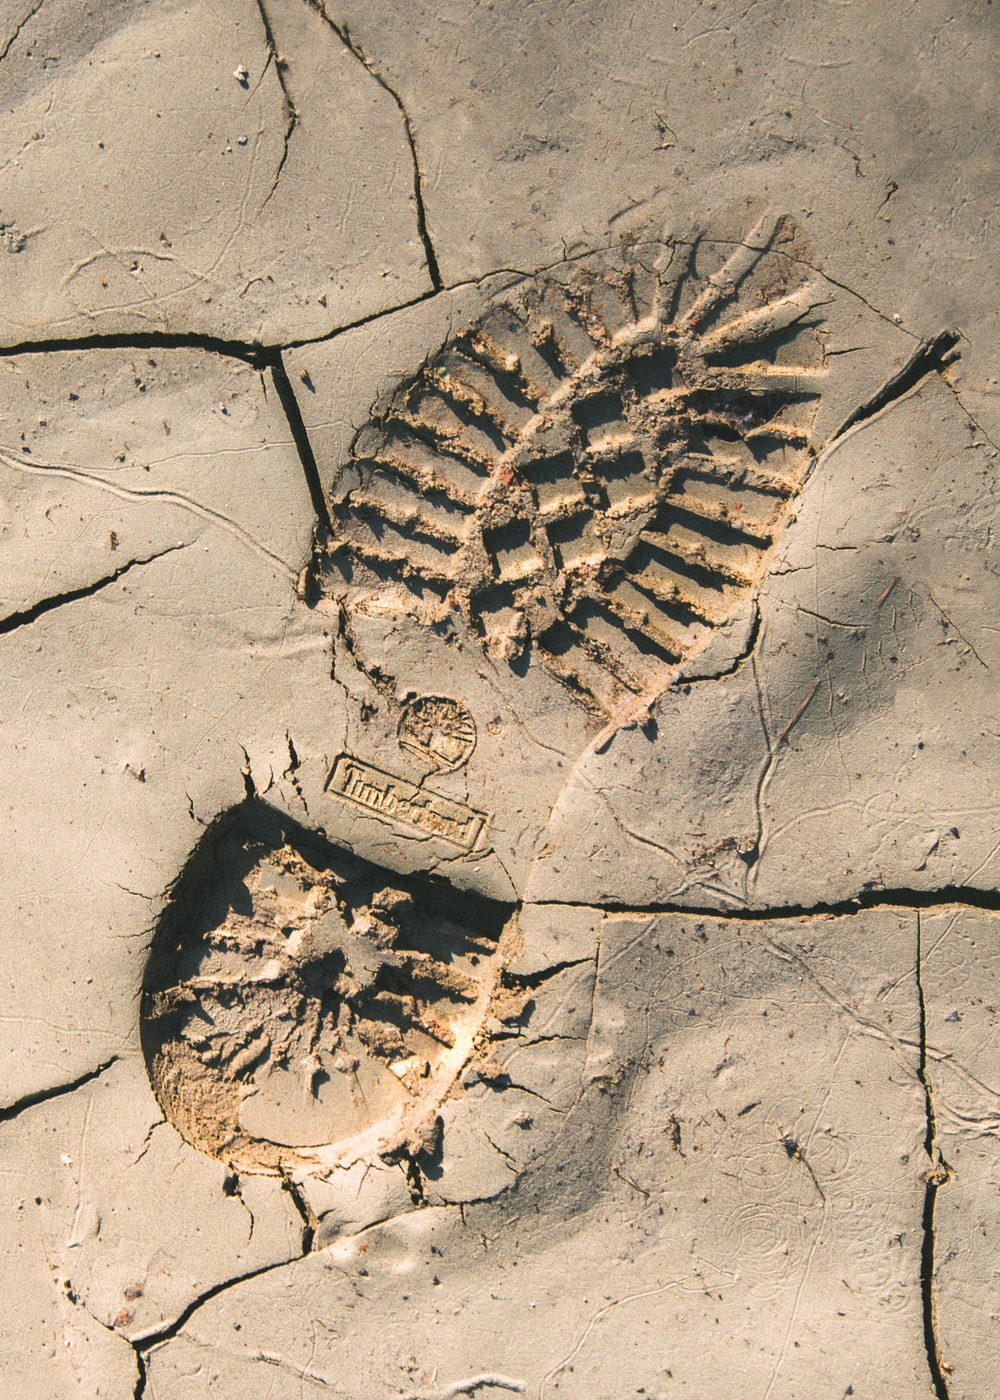 Timberland boot footprint on sand